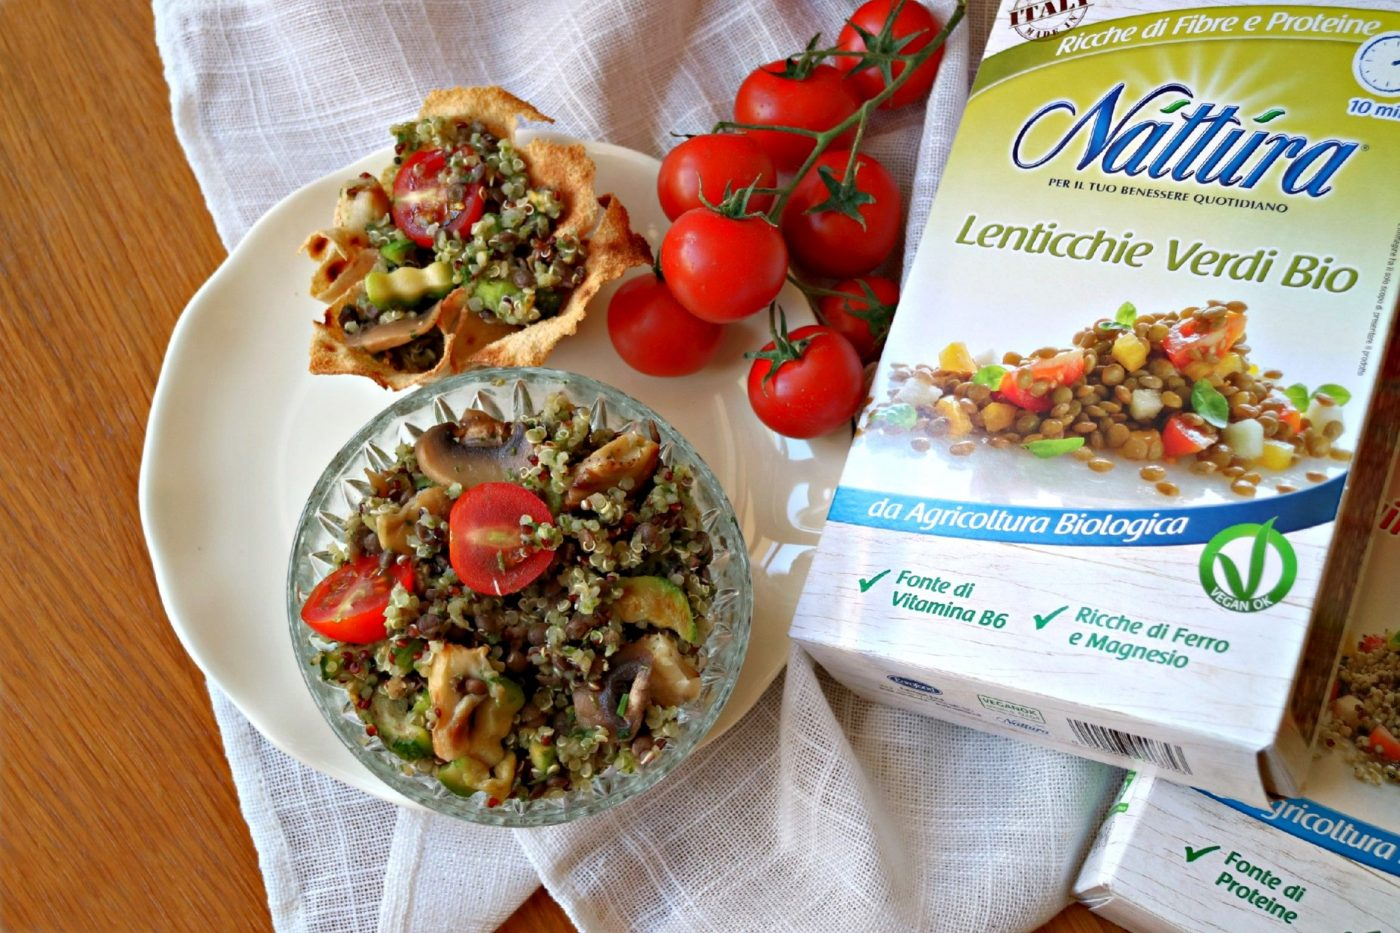 L'insalata di quinoa, lenticchie e verdure